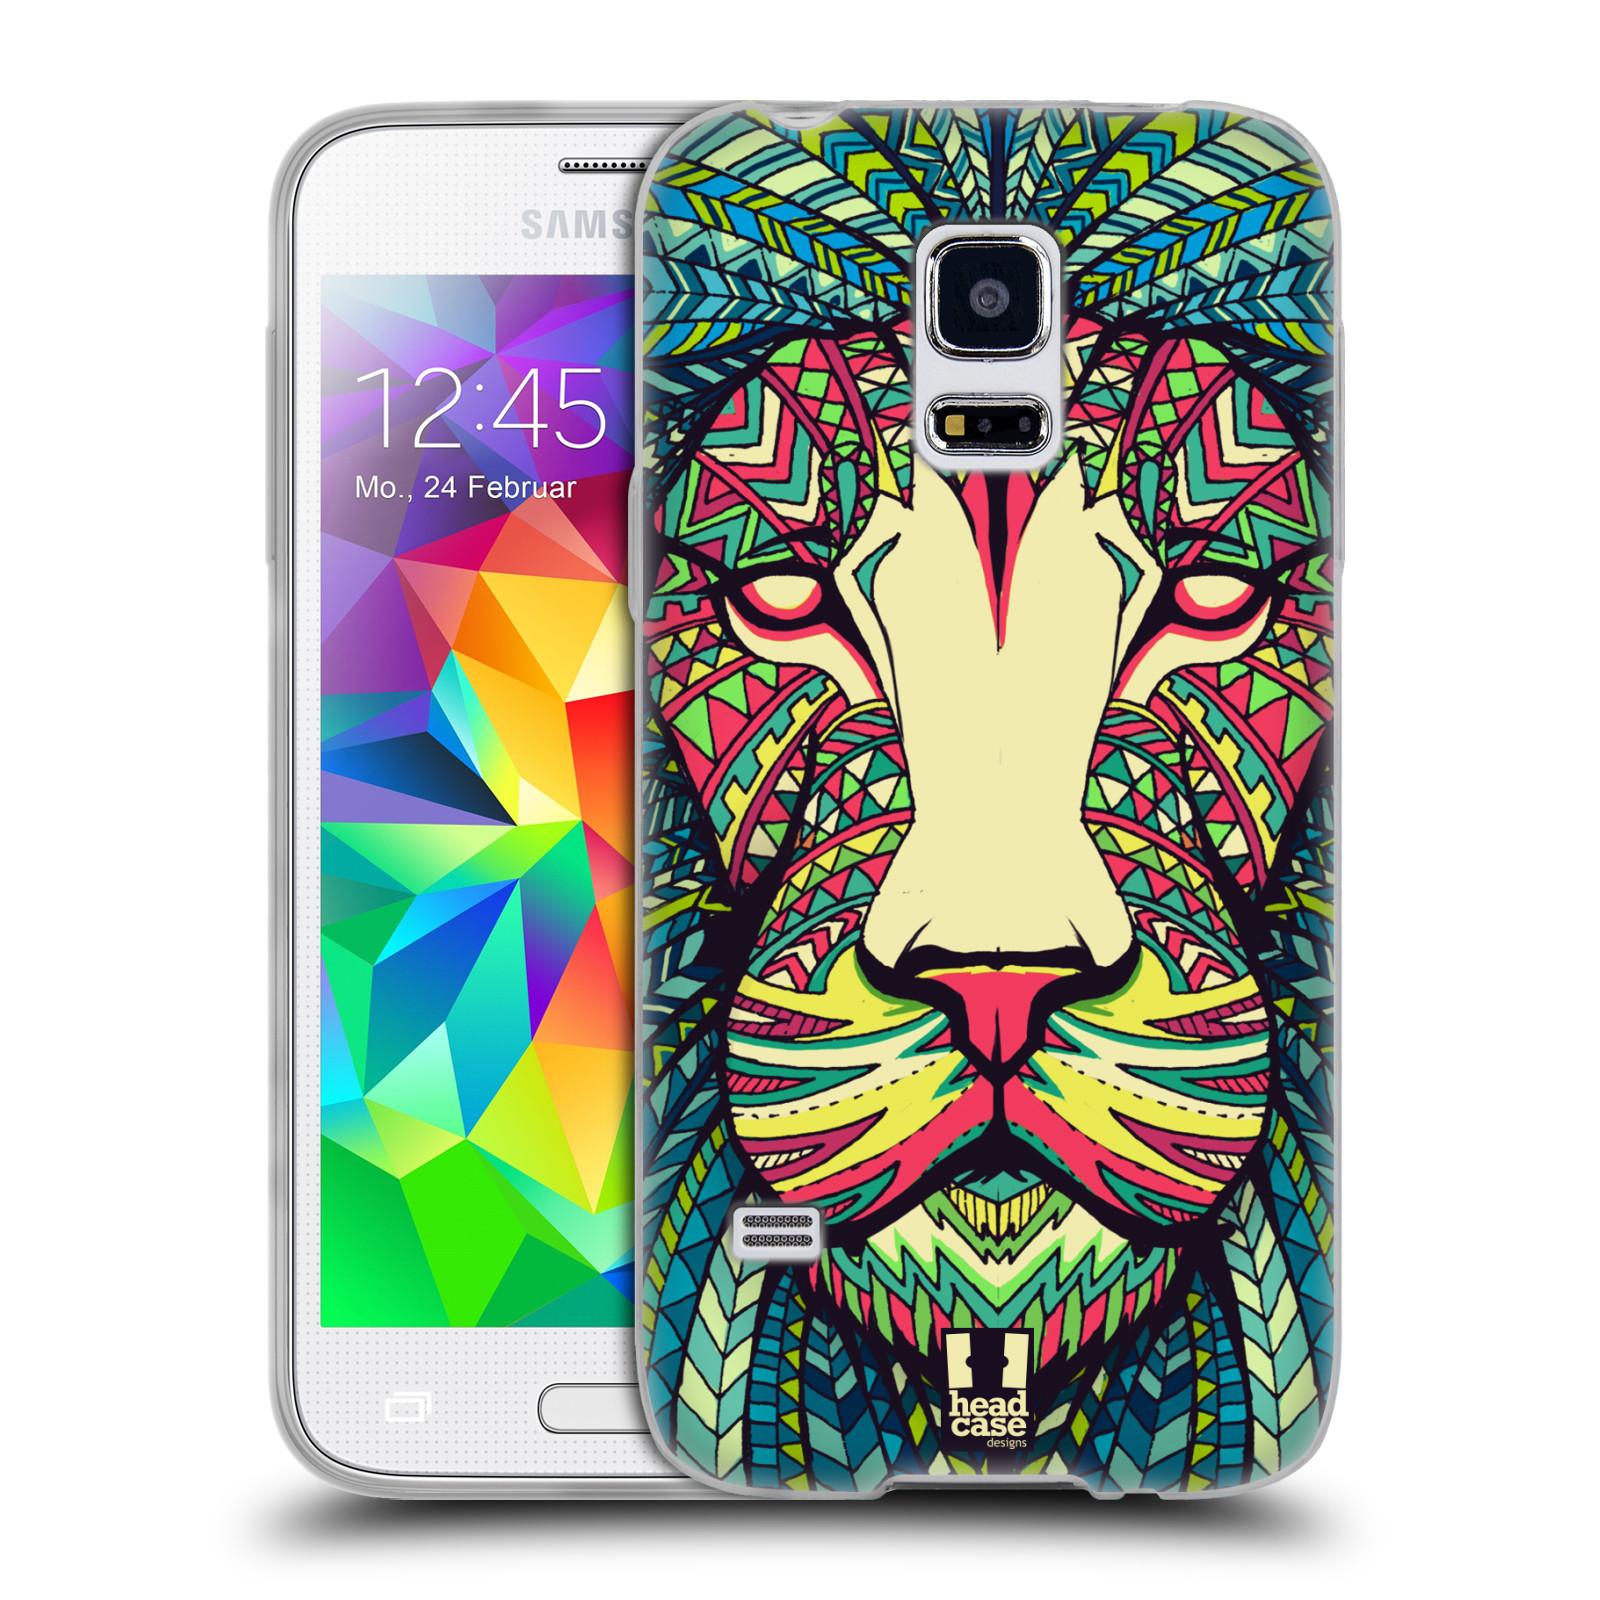 HEAD CASE silikonový obal na mobil Samsung Galaxy S5 MINI vzor Aztécký motiv zvíře lev